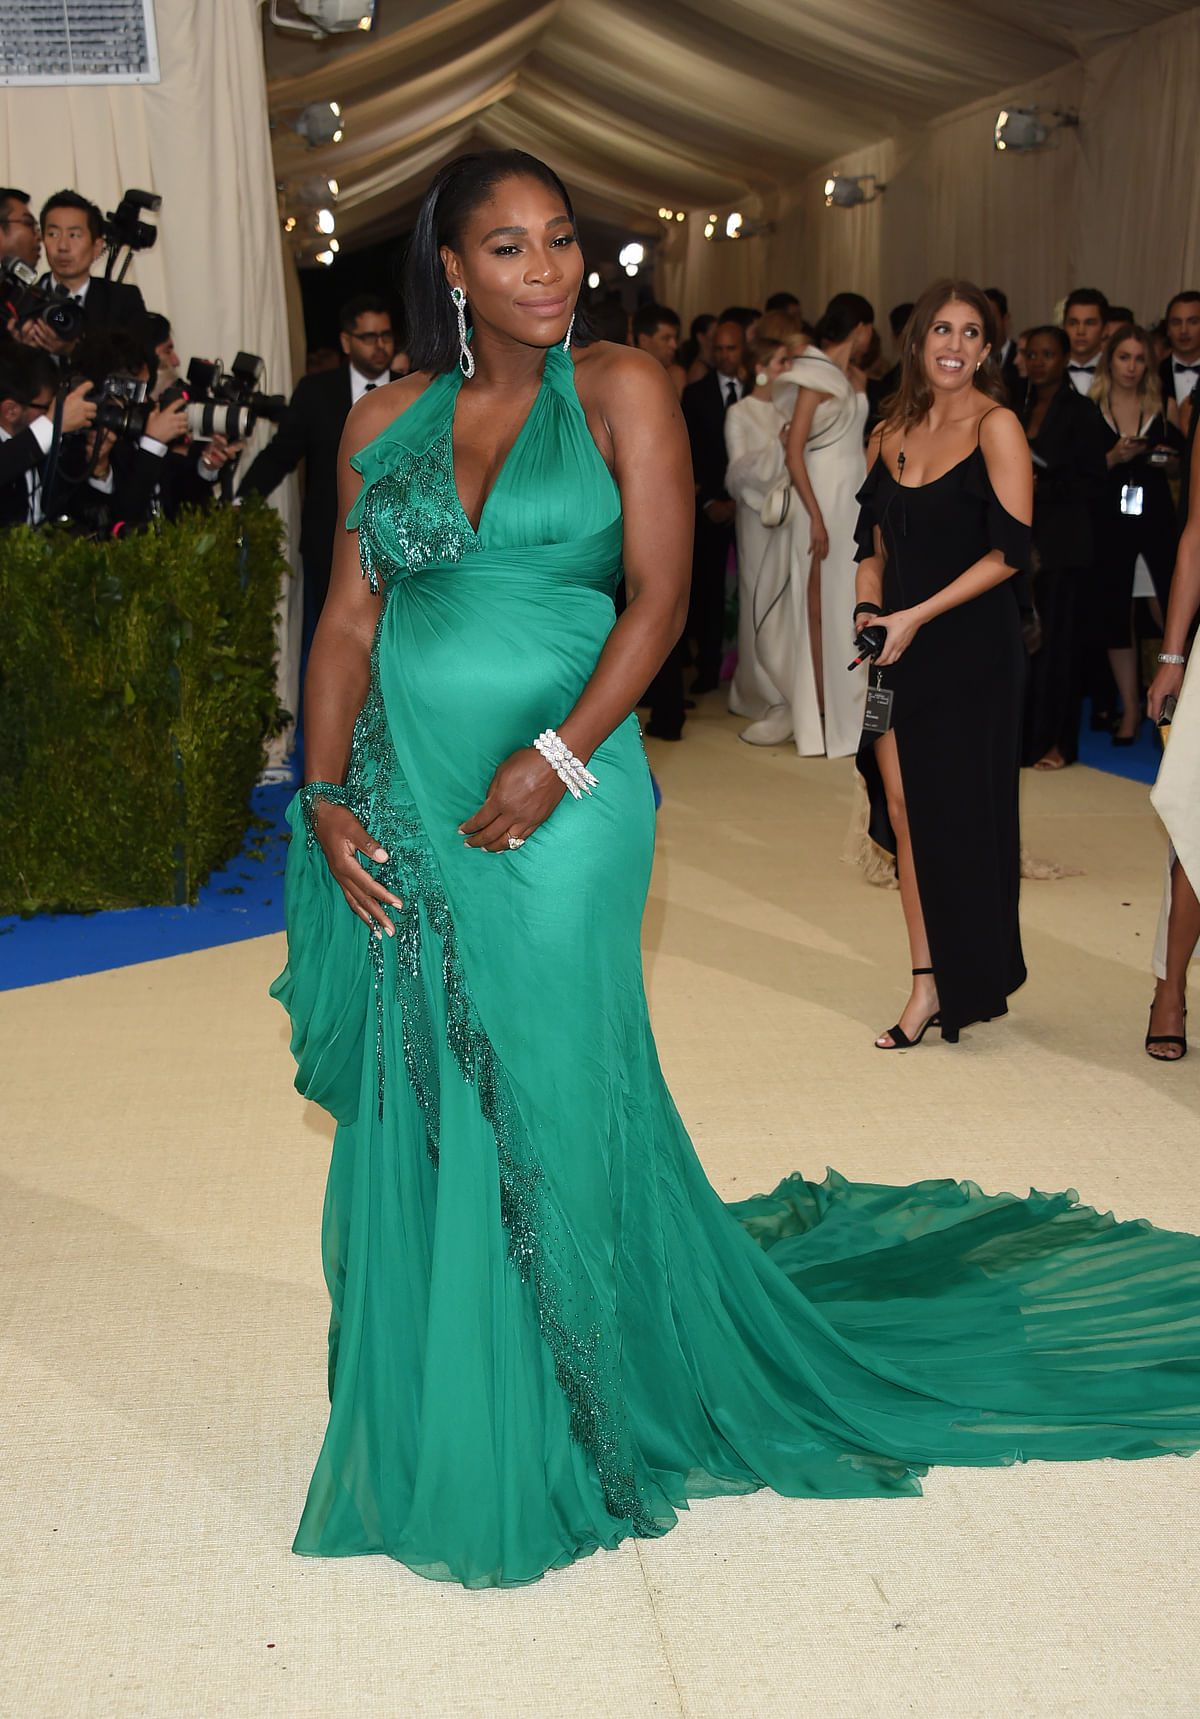 Serena Williams at The Metropolitan Museum of Art's Costume Institute benefit gala. (Photo: AP)